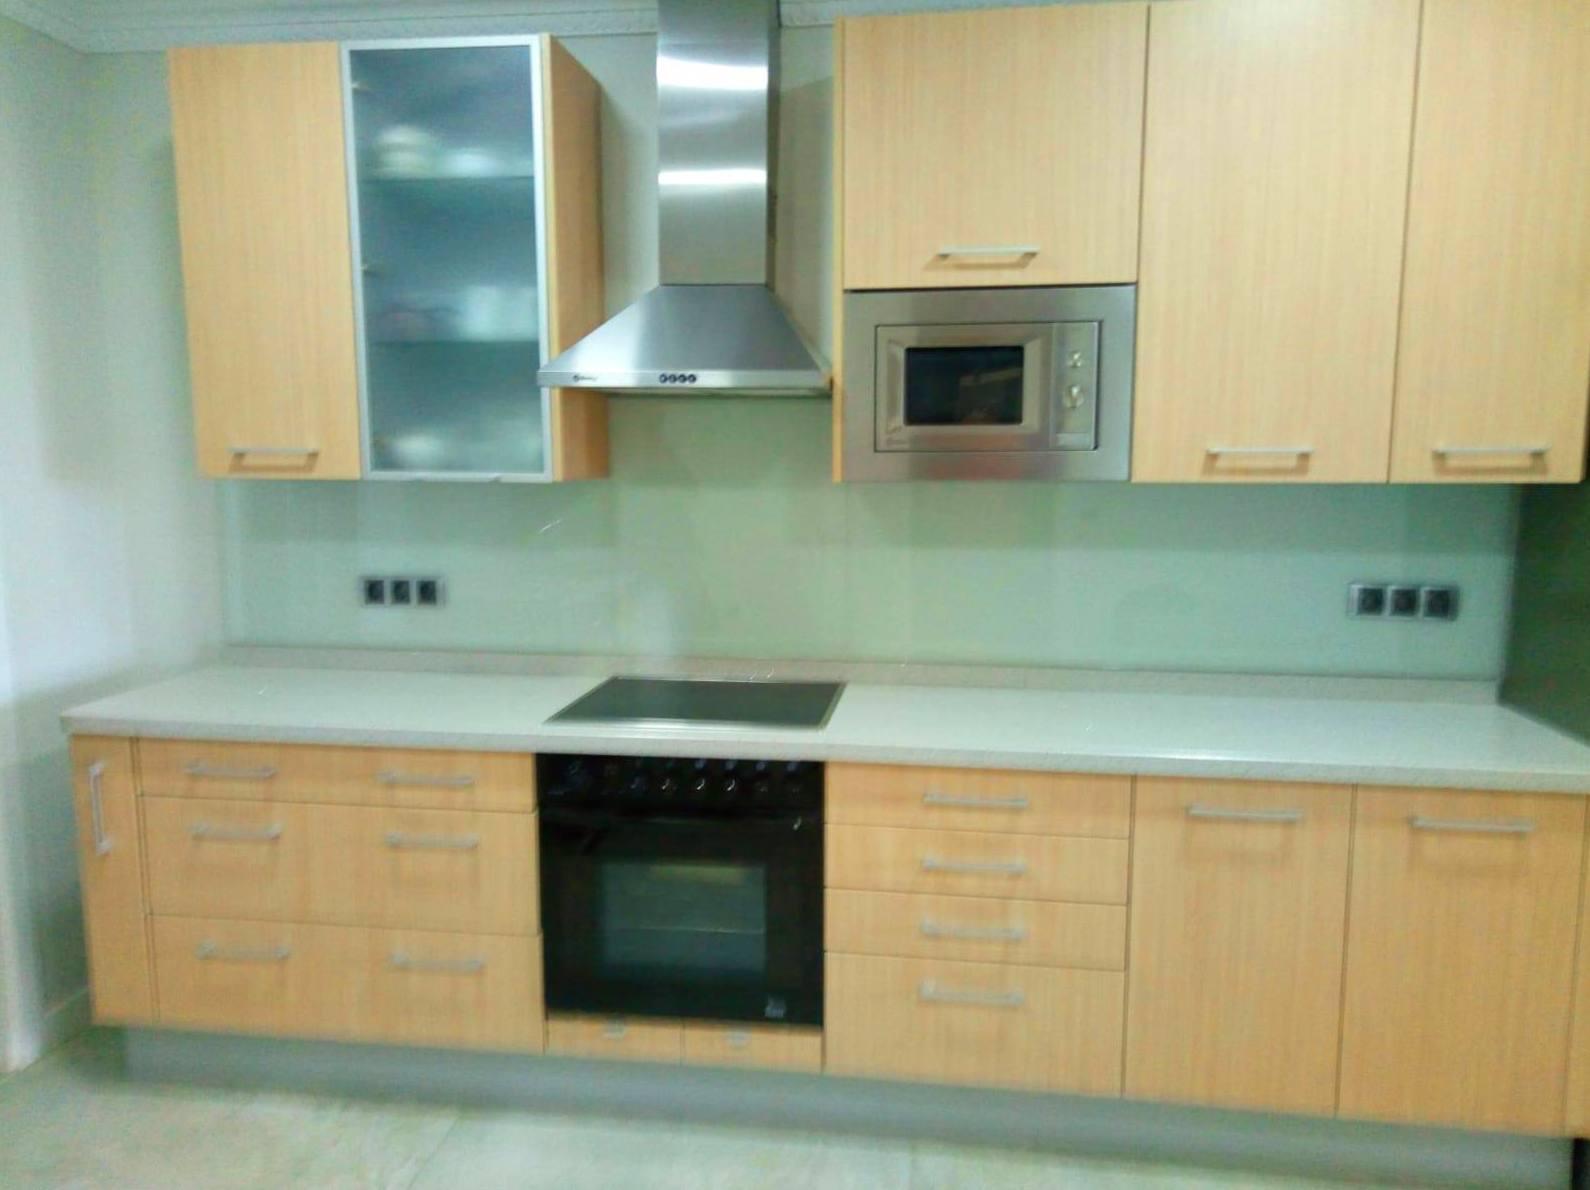 Frontal de cocina de cristal lacobel blanco roto con cajas para enchufes.